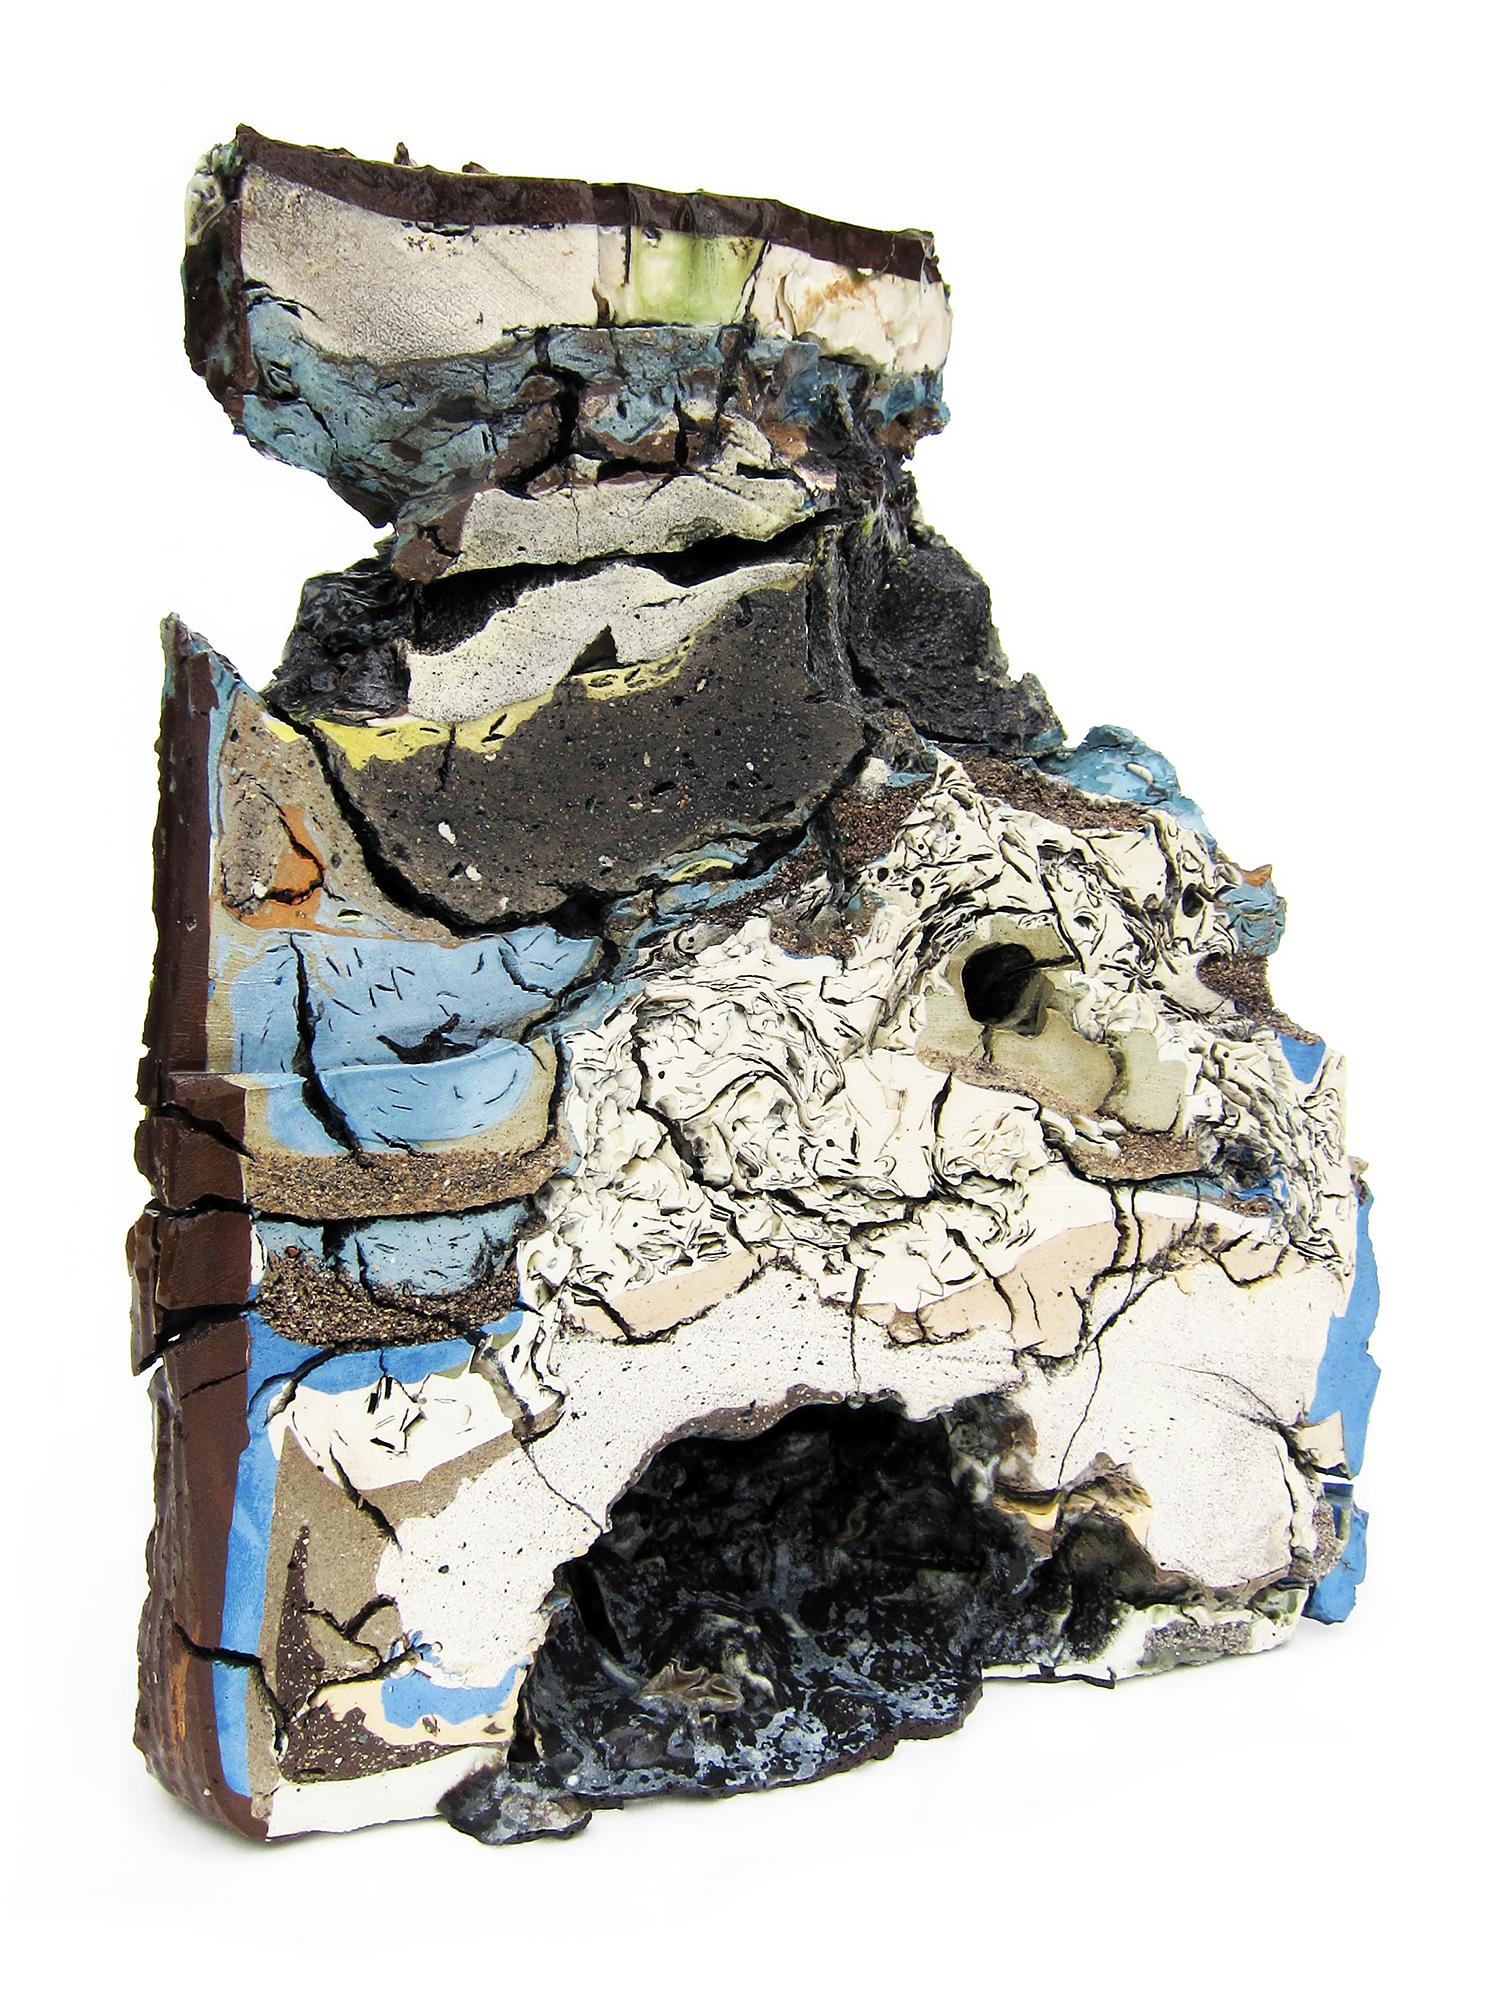 "<em>Landfill No.9: Northeastern Cross Section</em> <span style=""color:#CC0000;font-size:1.5em;"">&bull;</span>"